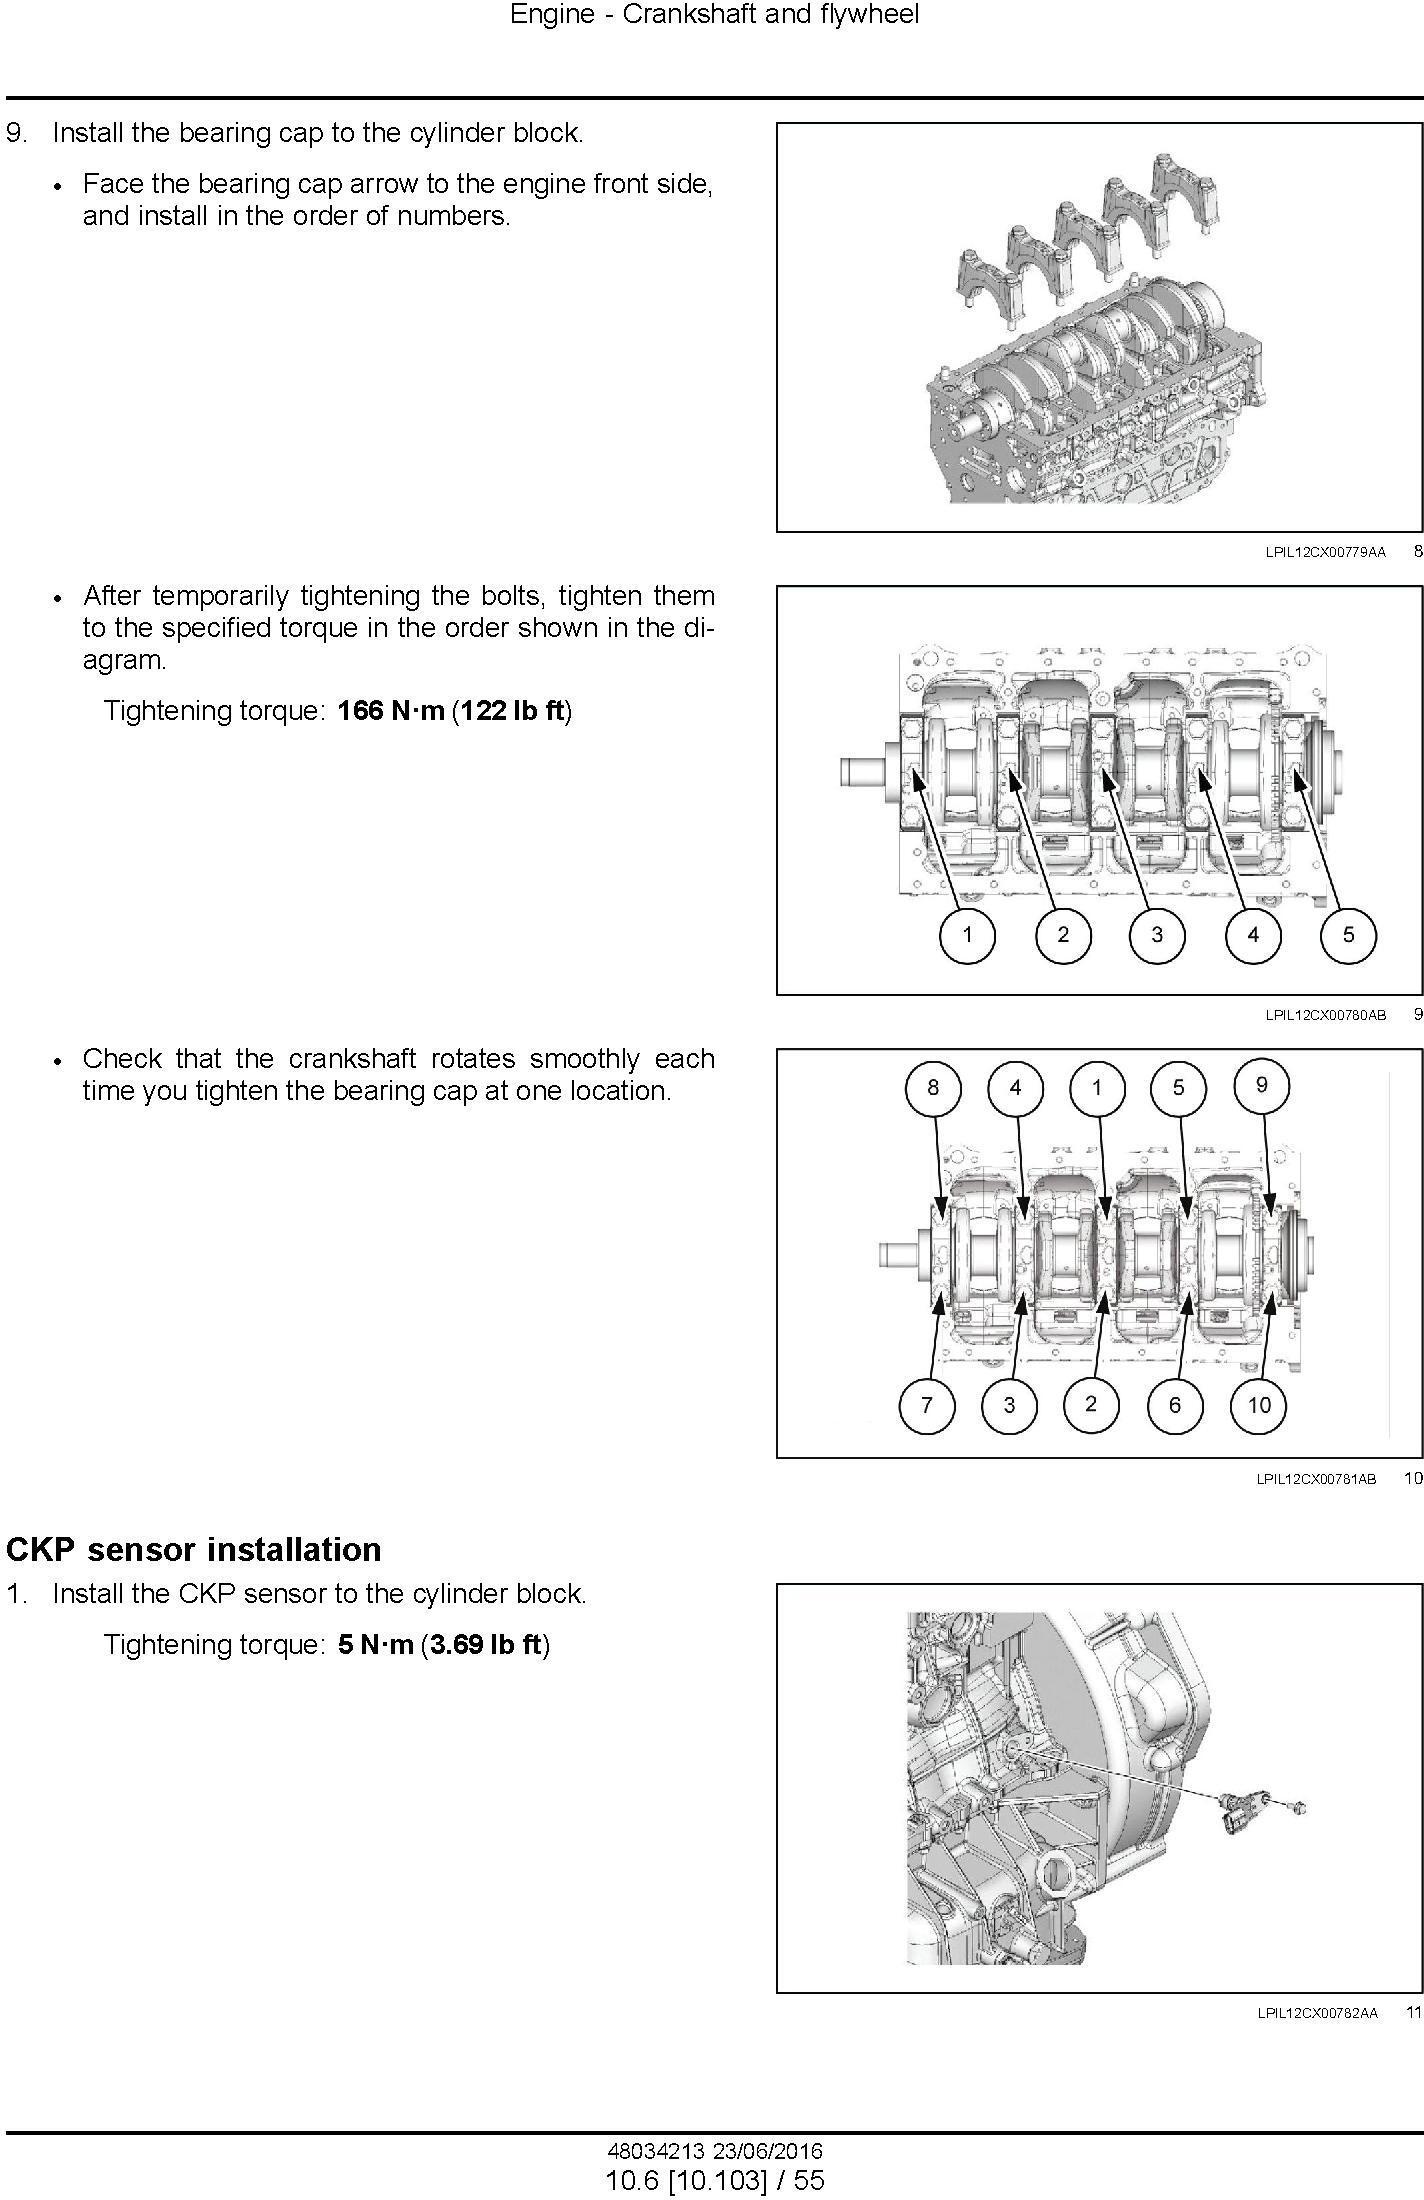 New Holland E145c Evo Crawler Excavator Service Manual